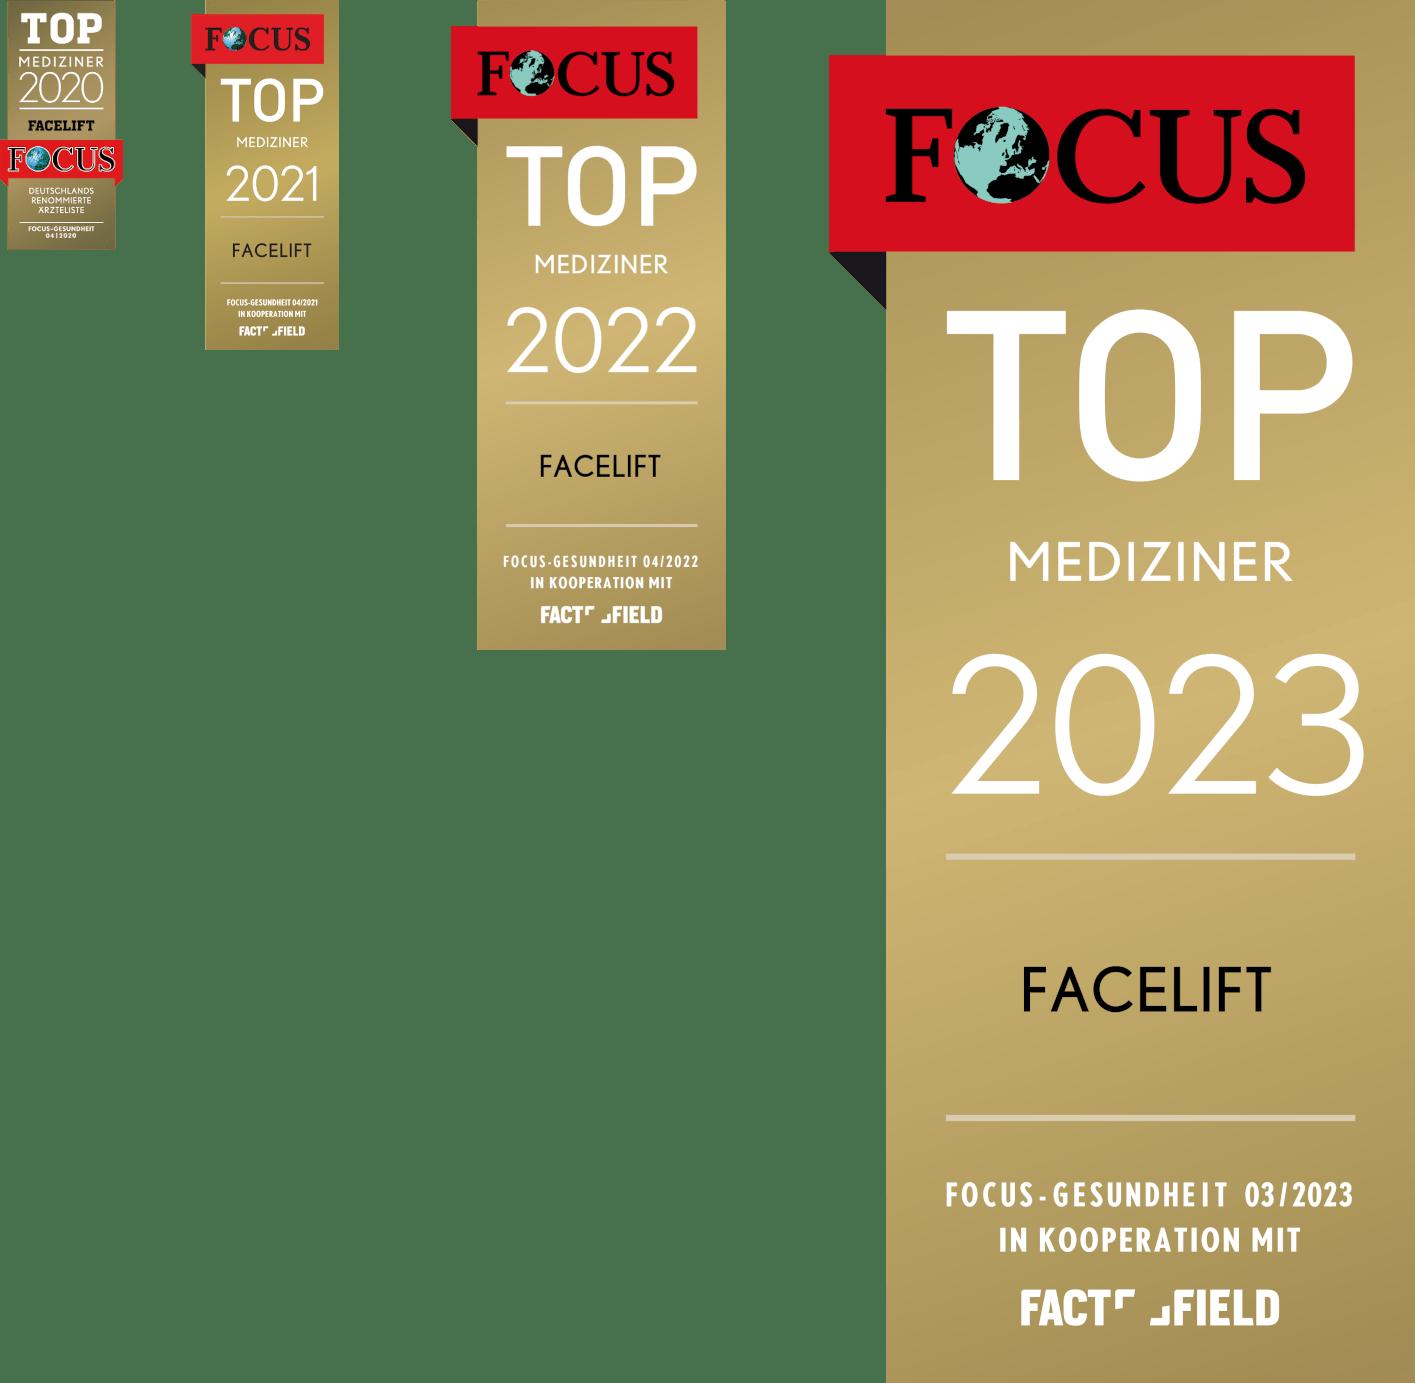 Dr. Funk - Top-Mediziner Facelift bei Focus